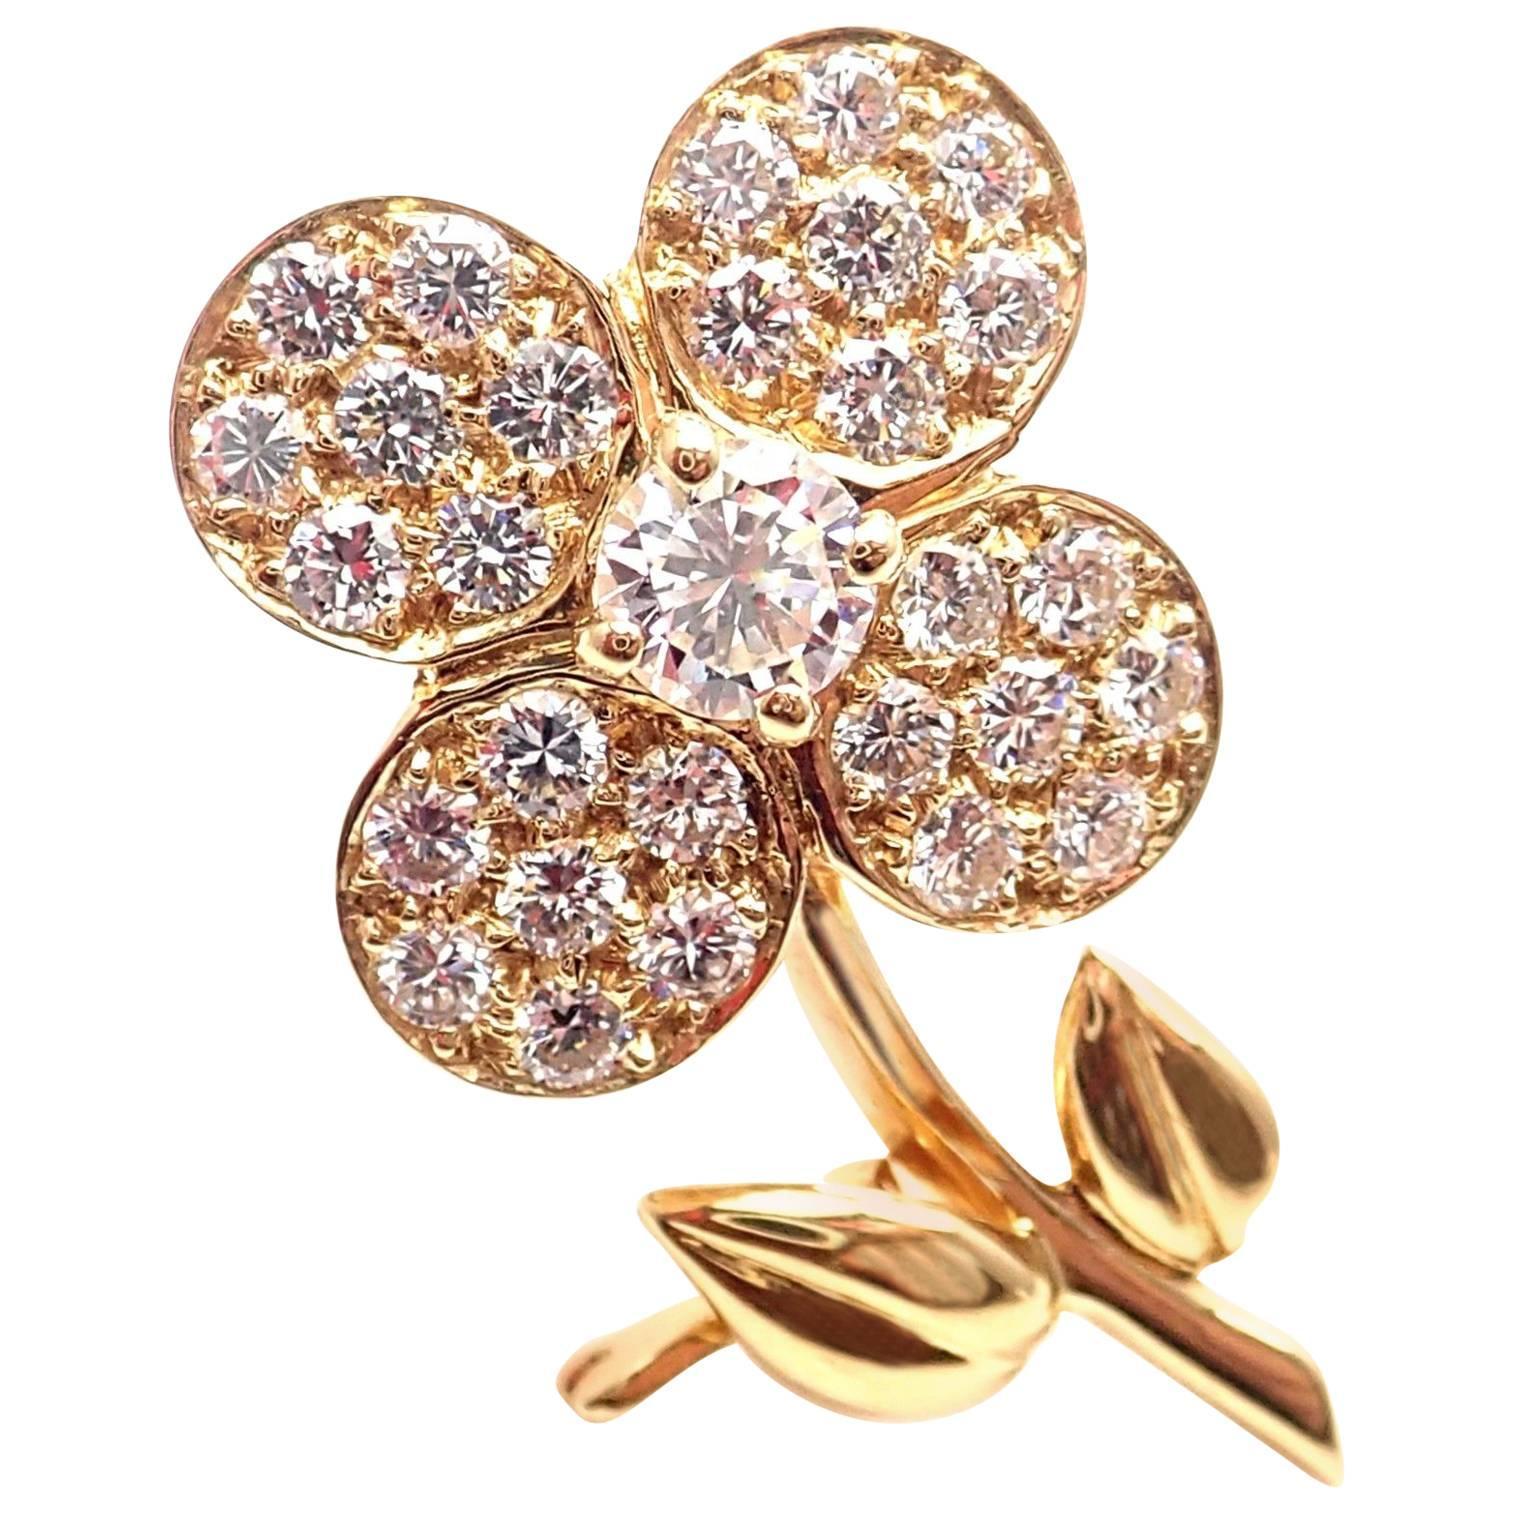 Van Cleef & Arpels Diamond Flower Yellow Gold Pin Brooch